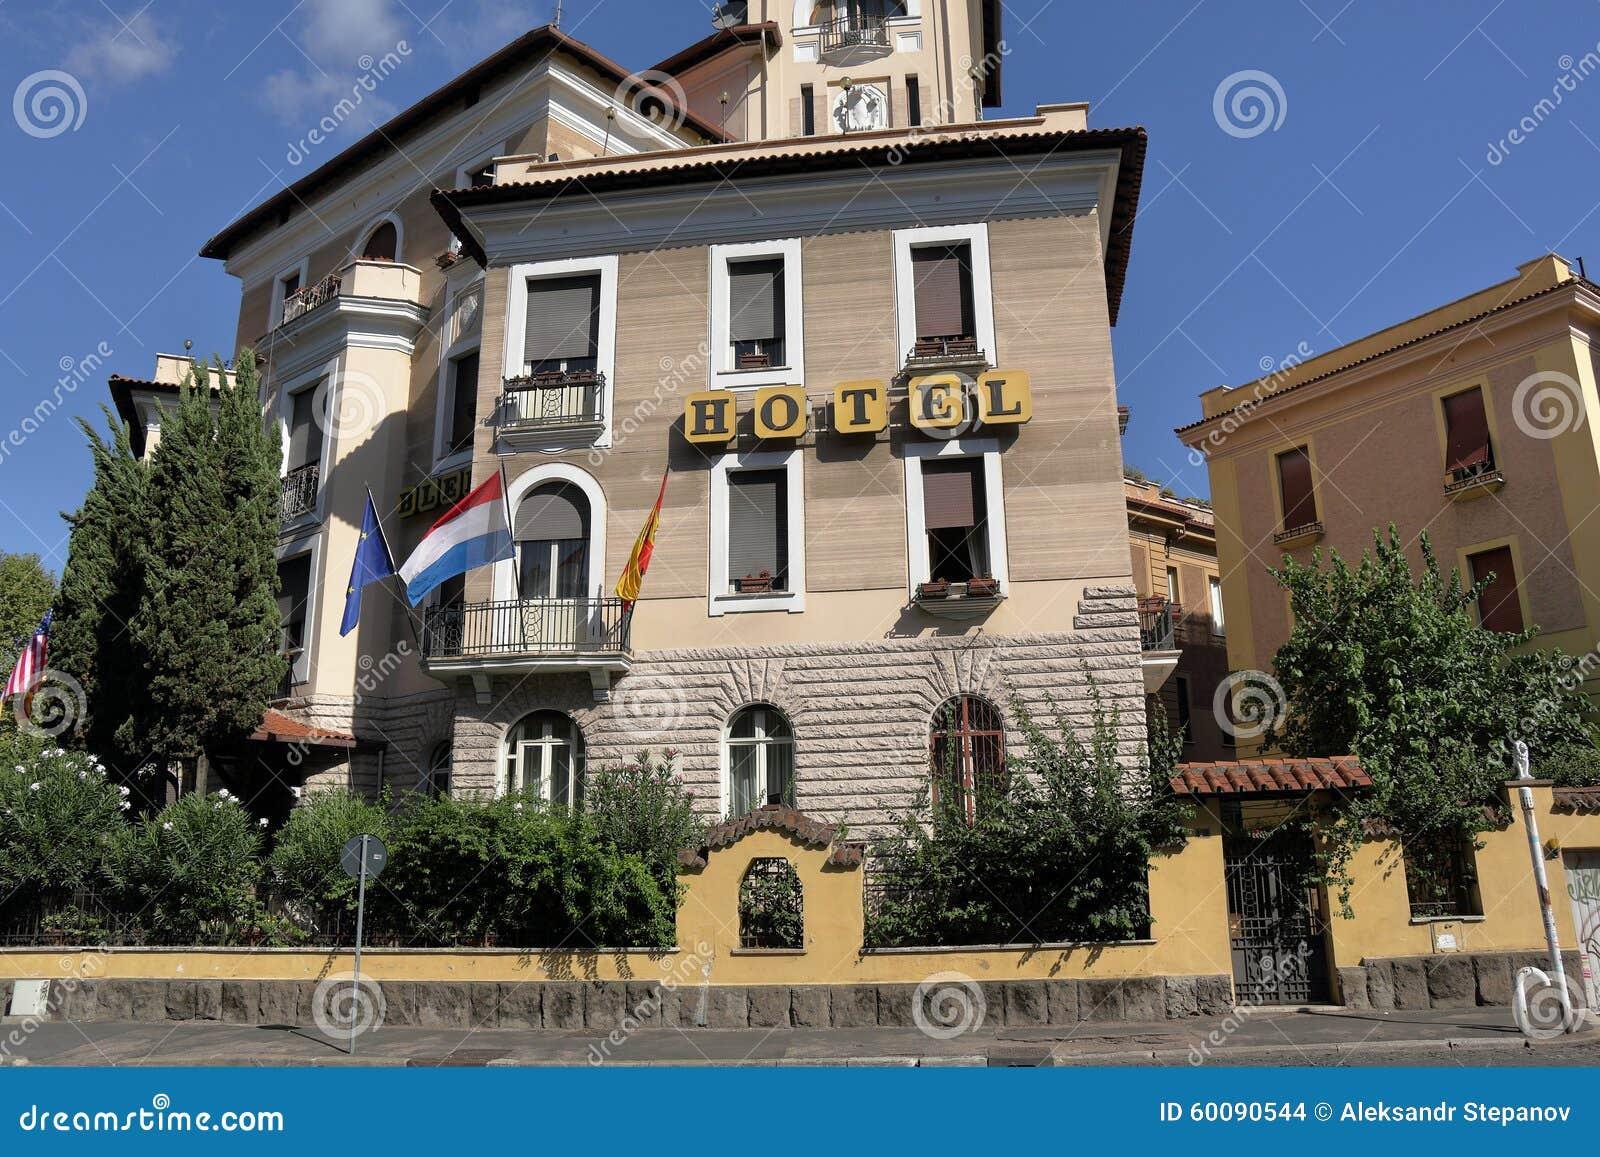 Schone Alte Fenster In Rom Italien Hotel Geblutet 59 Uber Santa